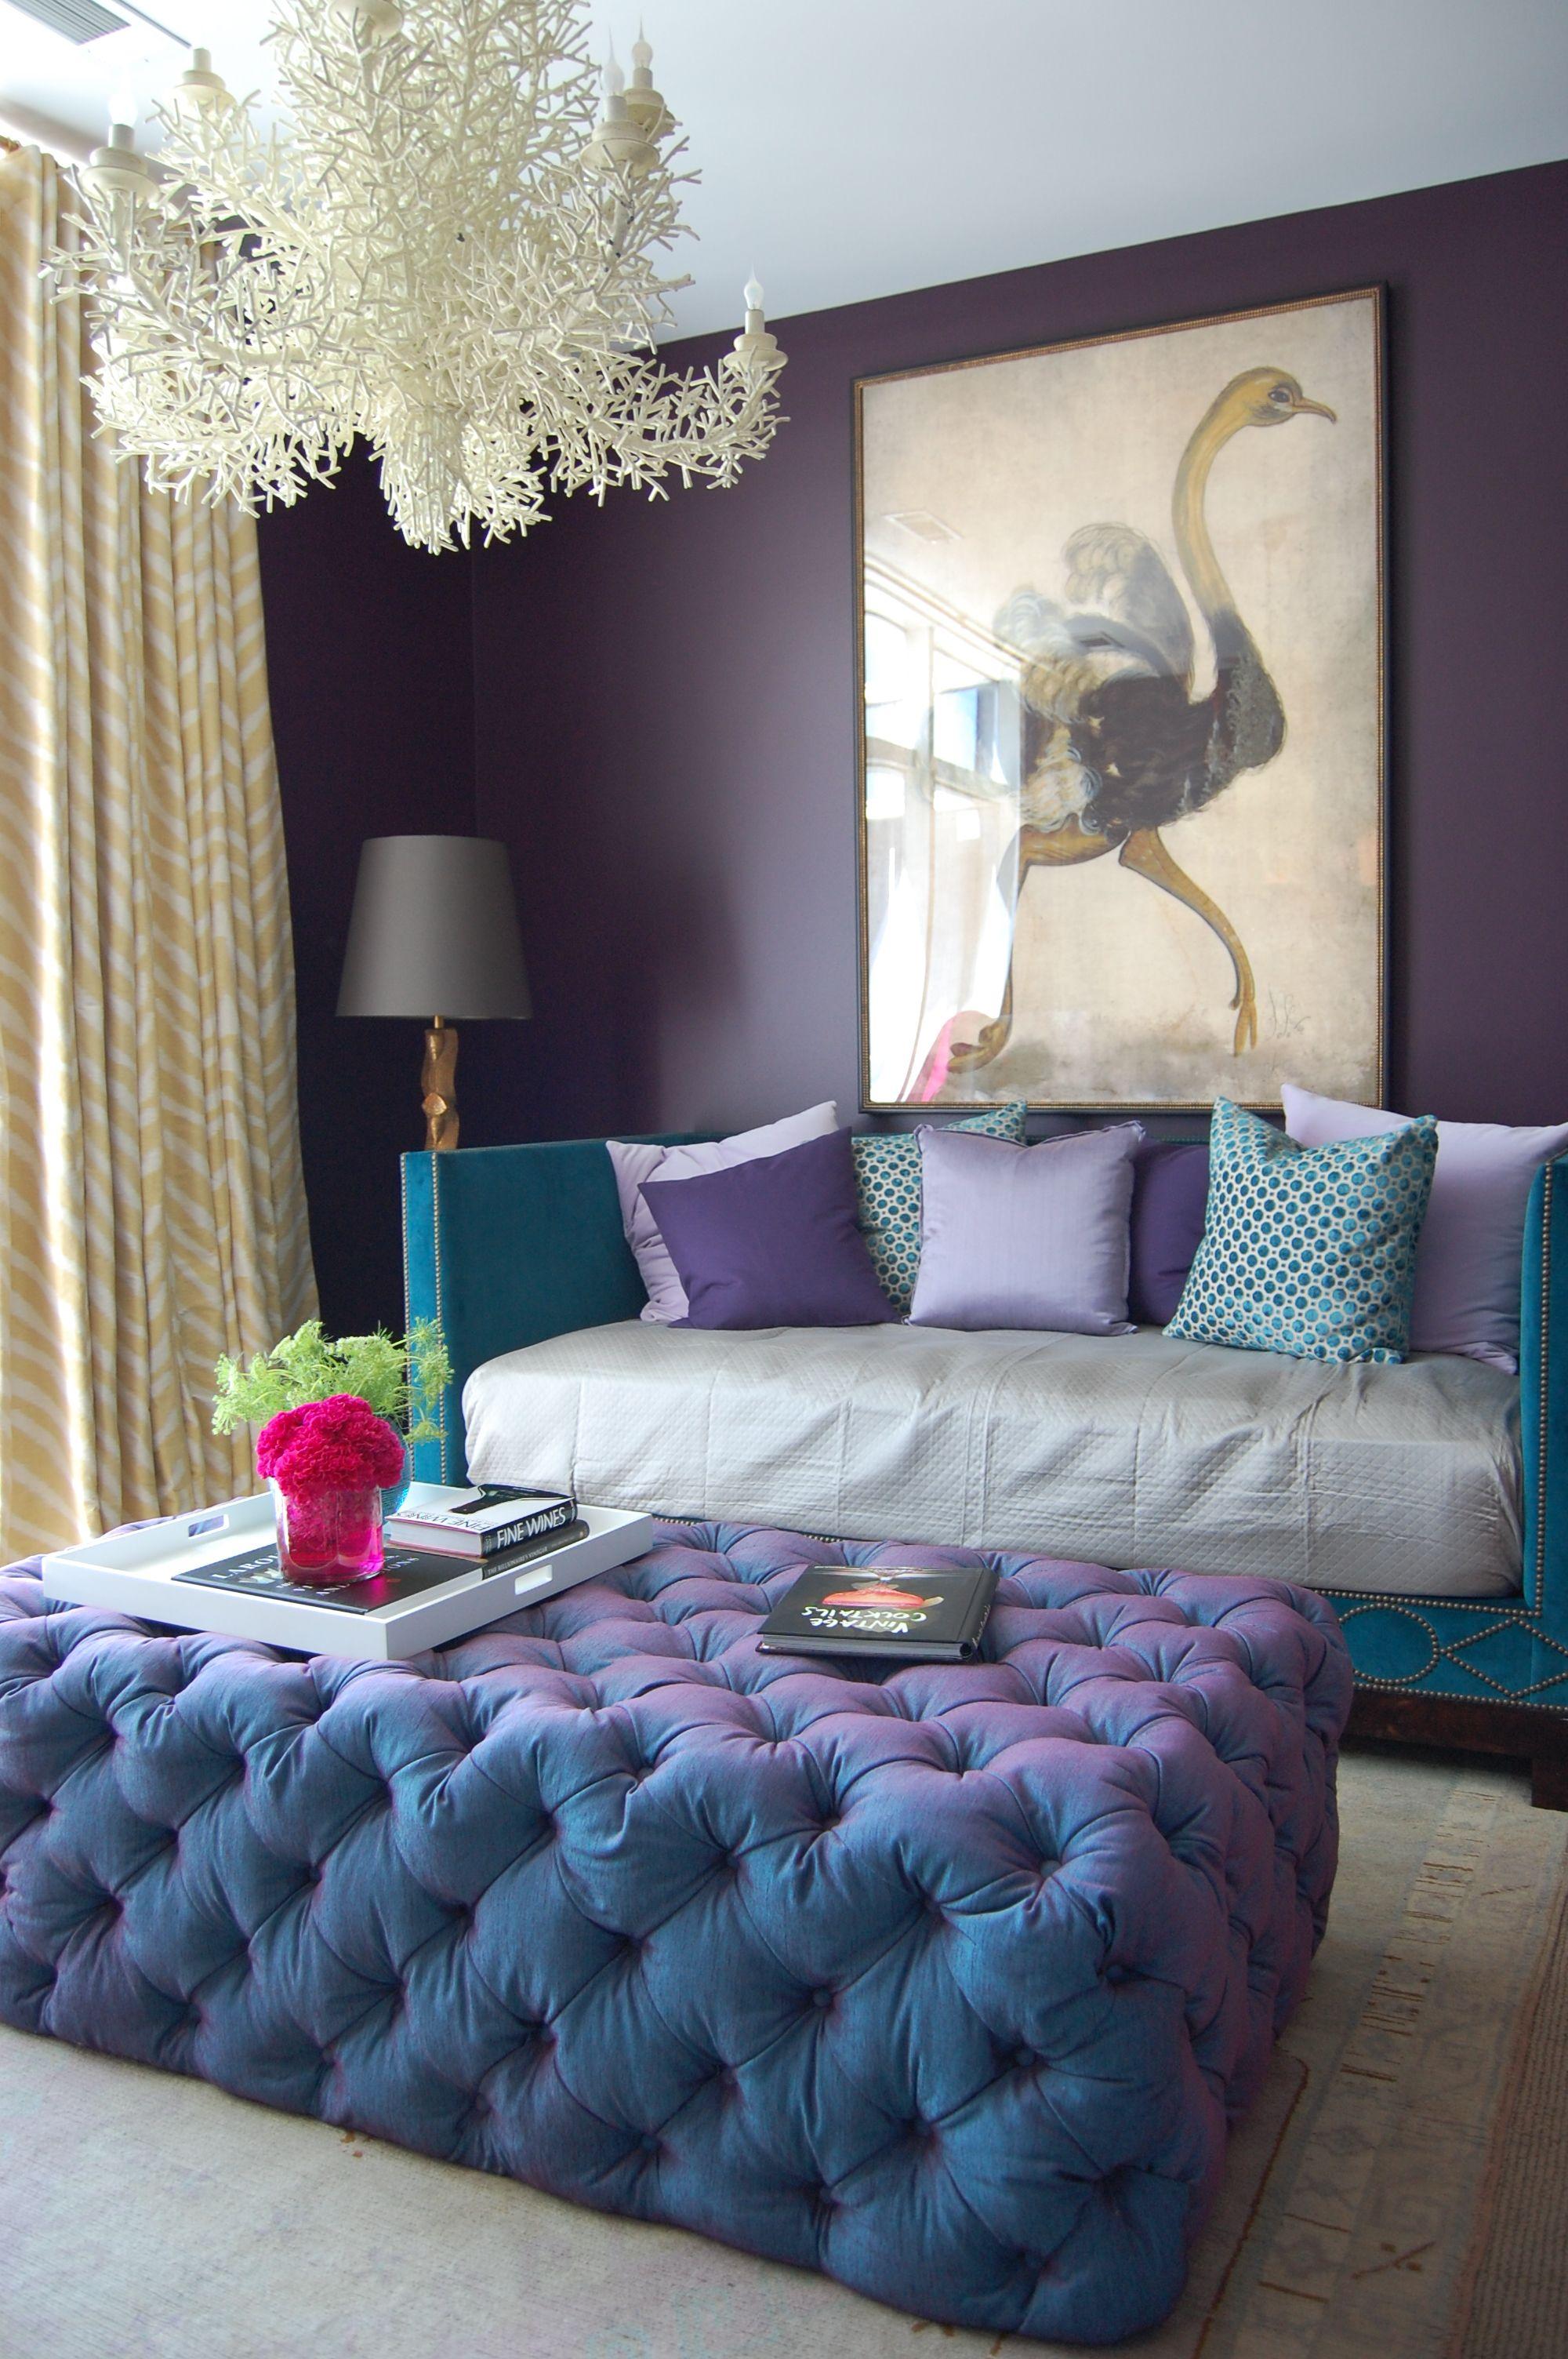 Awe Inspiring Tufted Ottoman Interior Design Quirky Home Decor Living Beatyapartments Chair Design Images Beatyapartmentscom